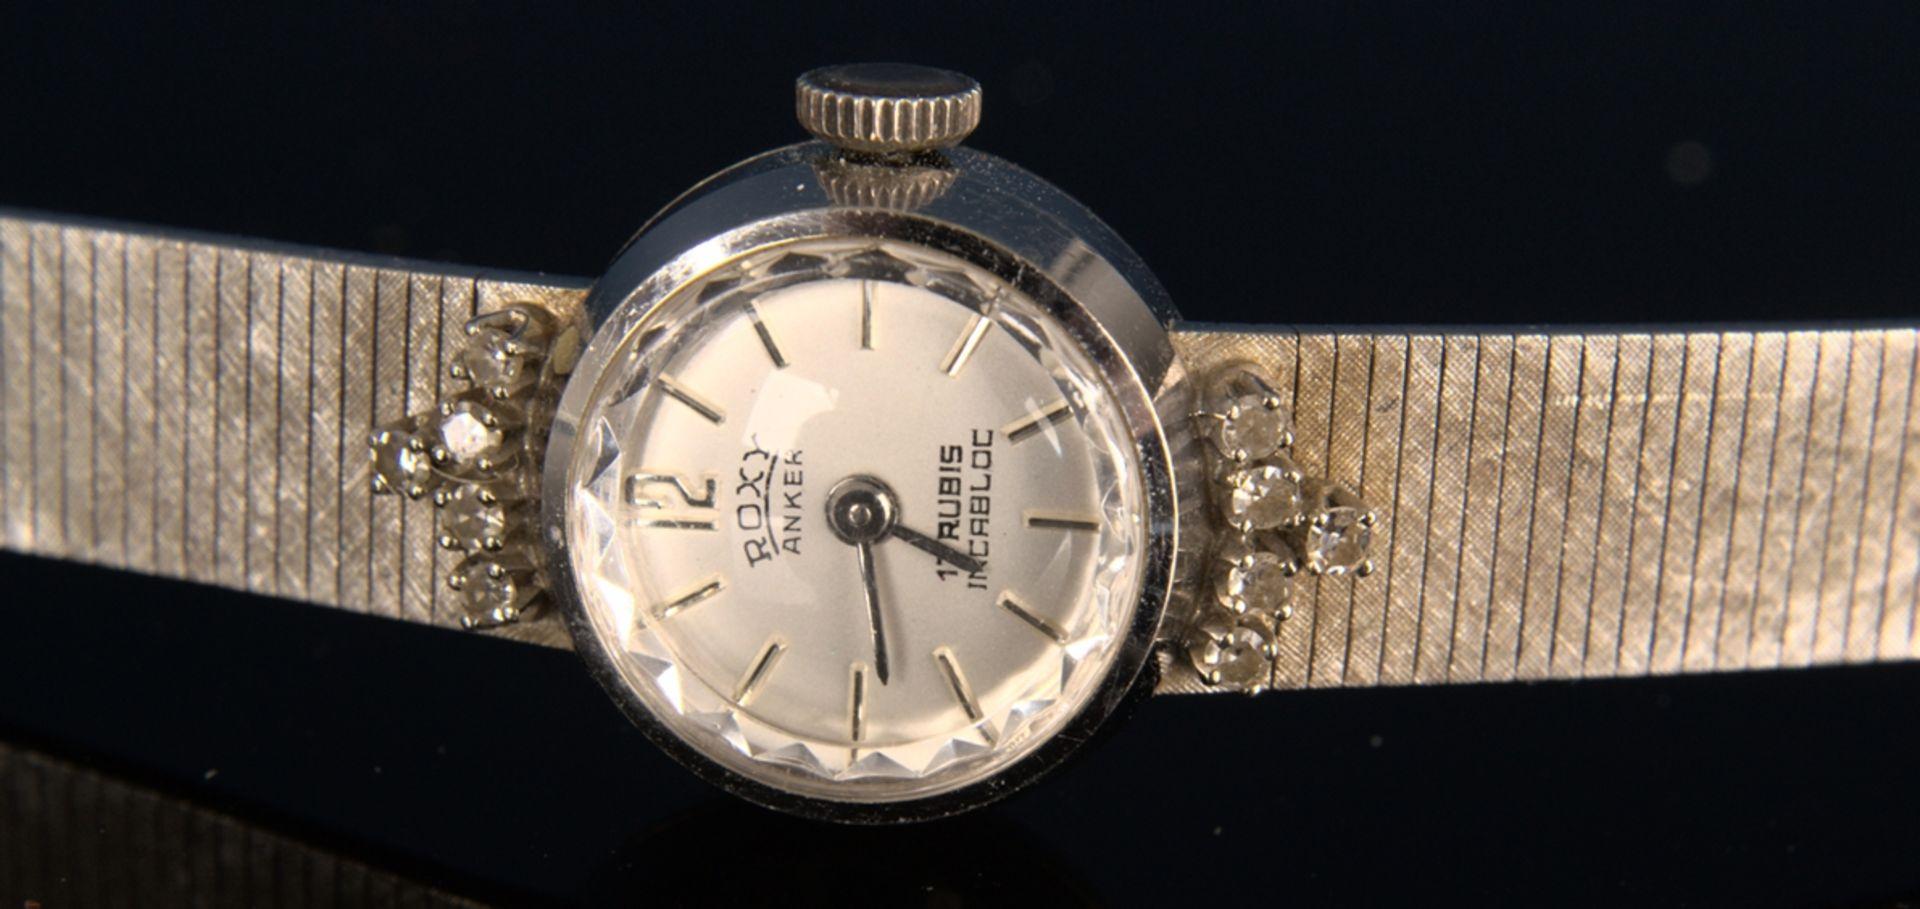 "Elegante COCKTAIL - Damenarmbanduhr der Marke ""ANKER - ROXY"" - 17 Rubis - Incabloc. Handaufzug, - Bild 3 aus 11"